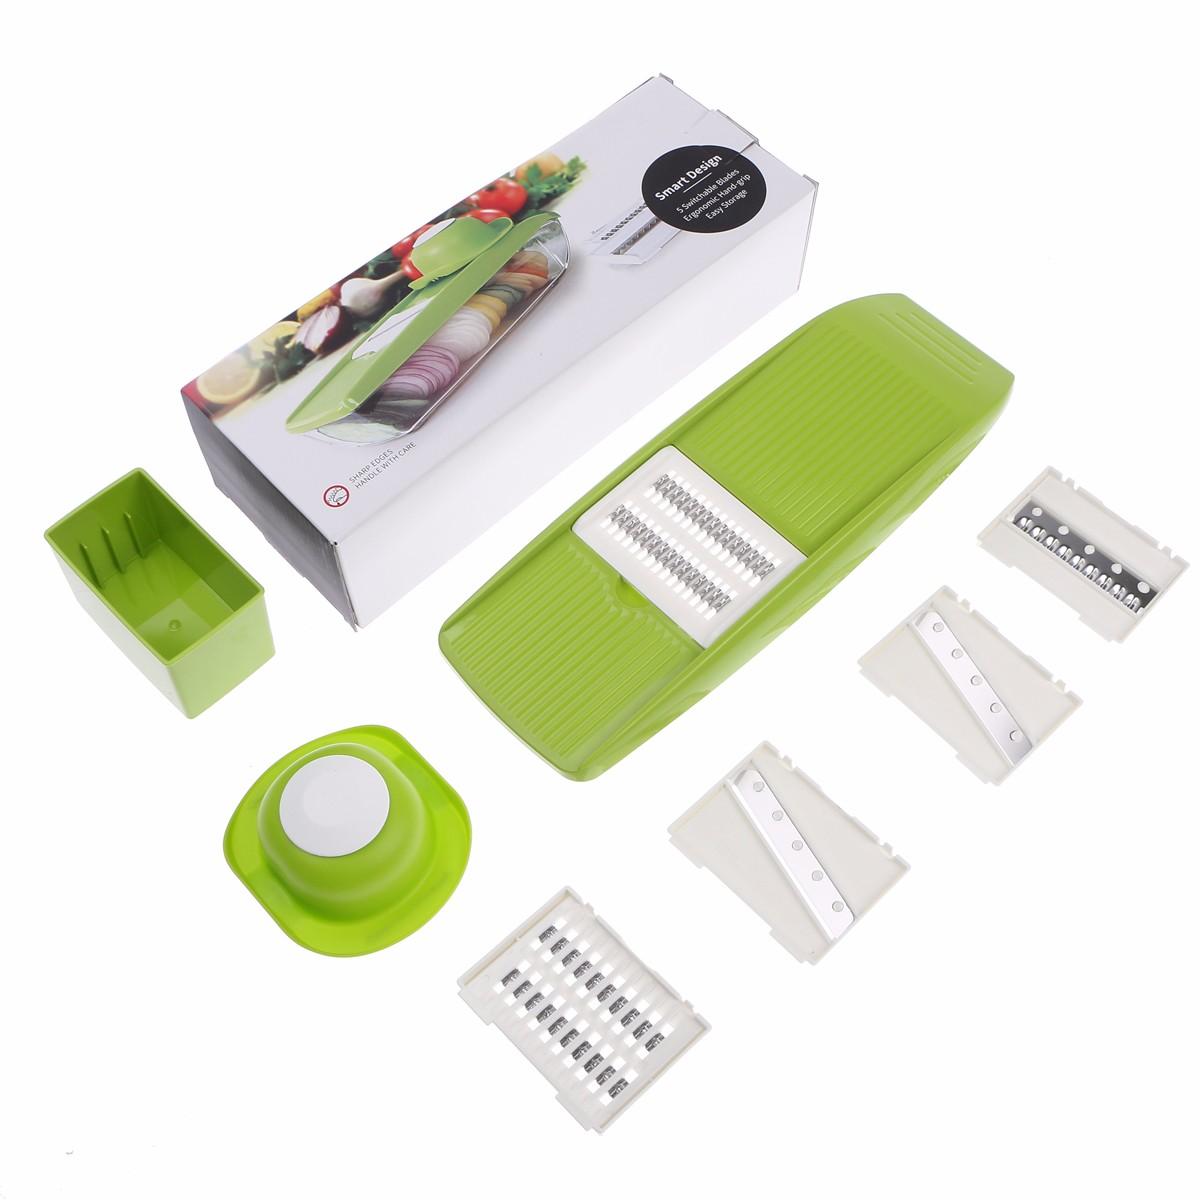 Multifunctional Vegetable Chopper Potato Filament Shredder Home Kitchen Planer Manual Chip Scrapers